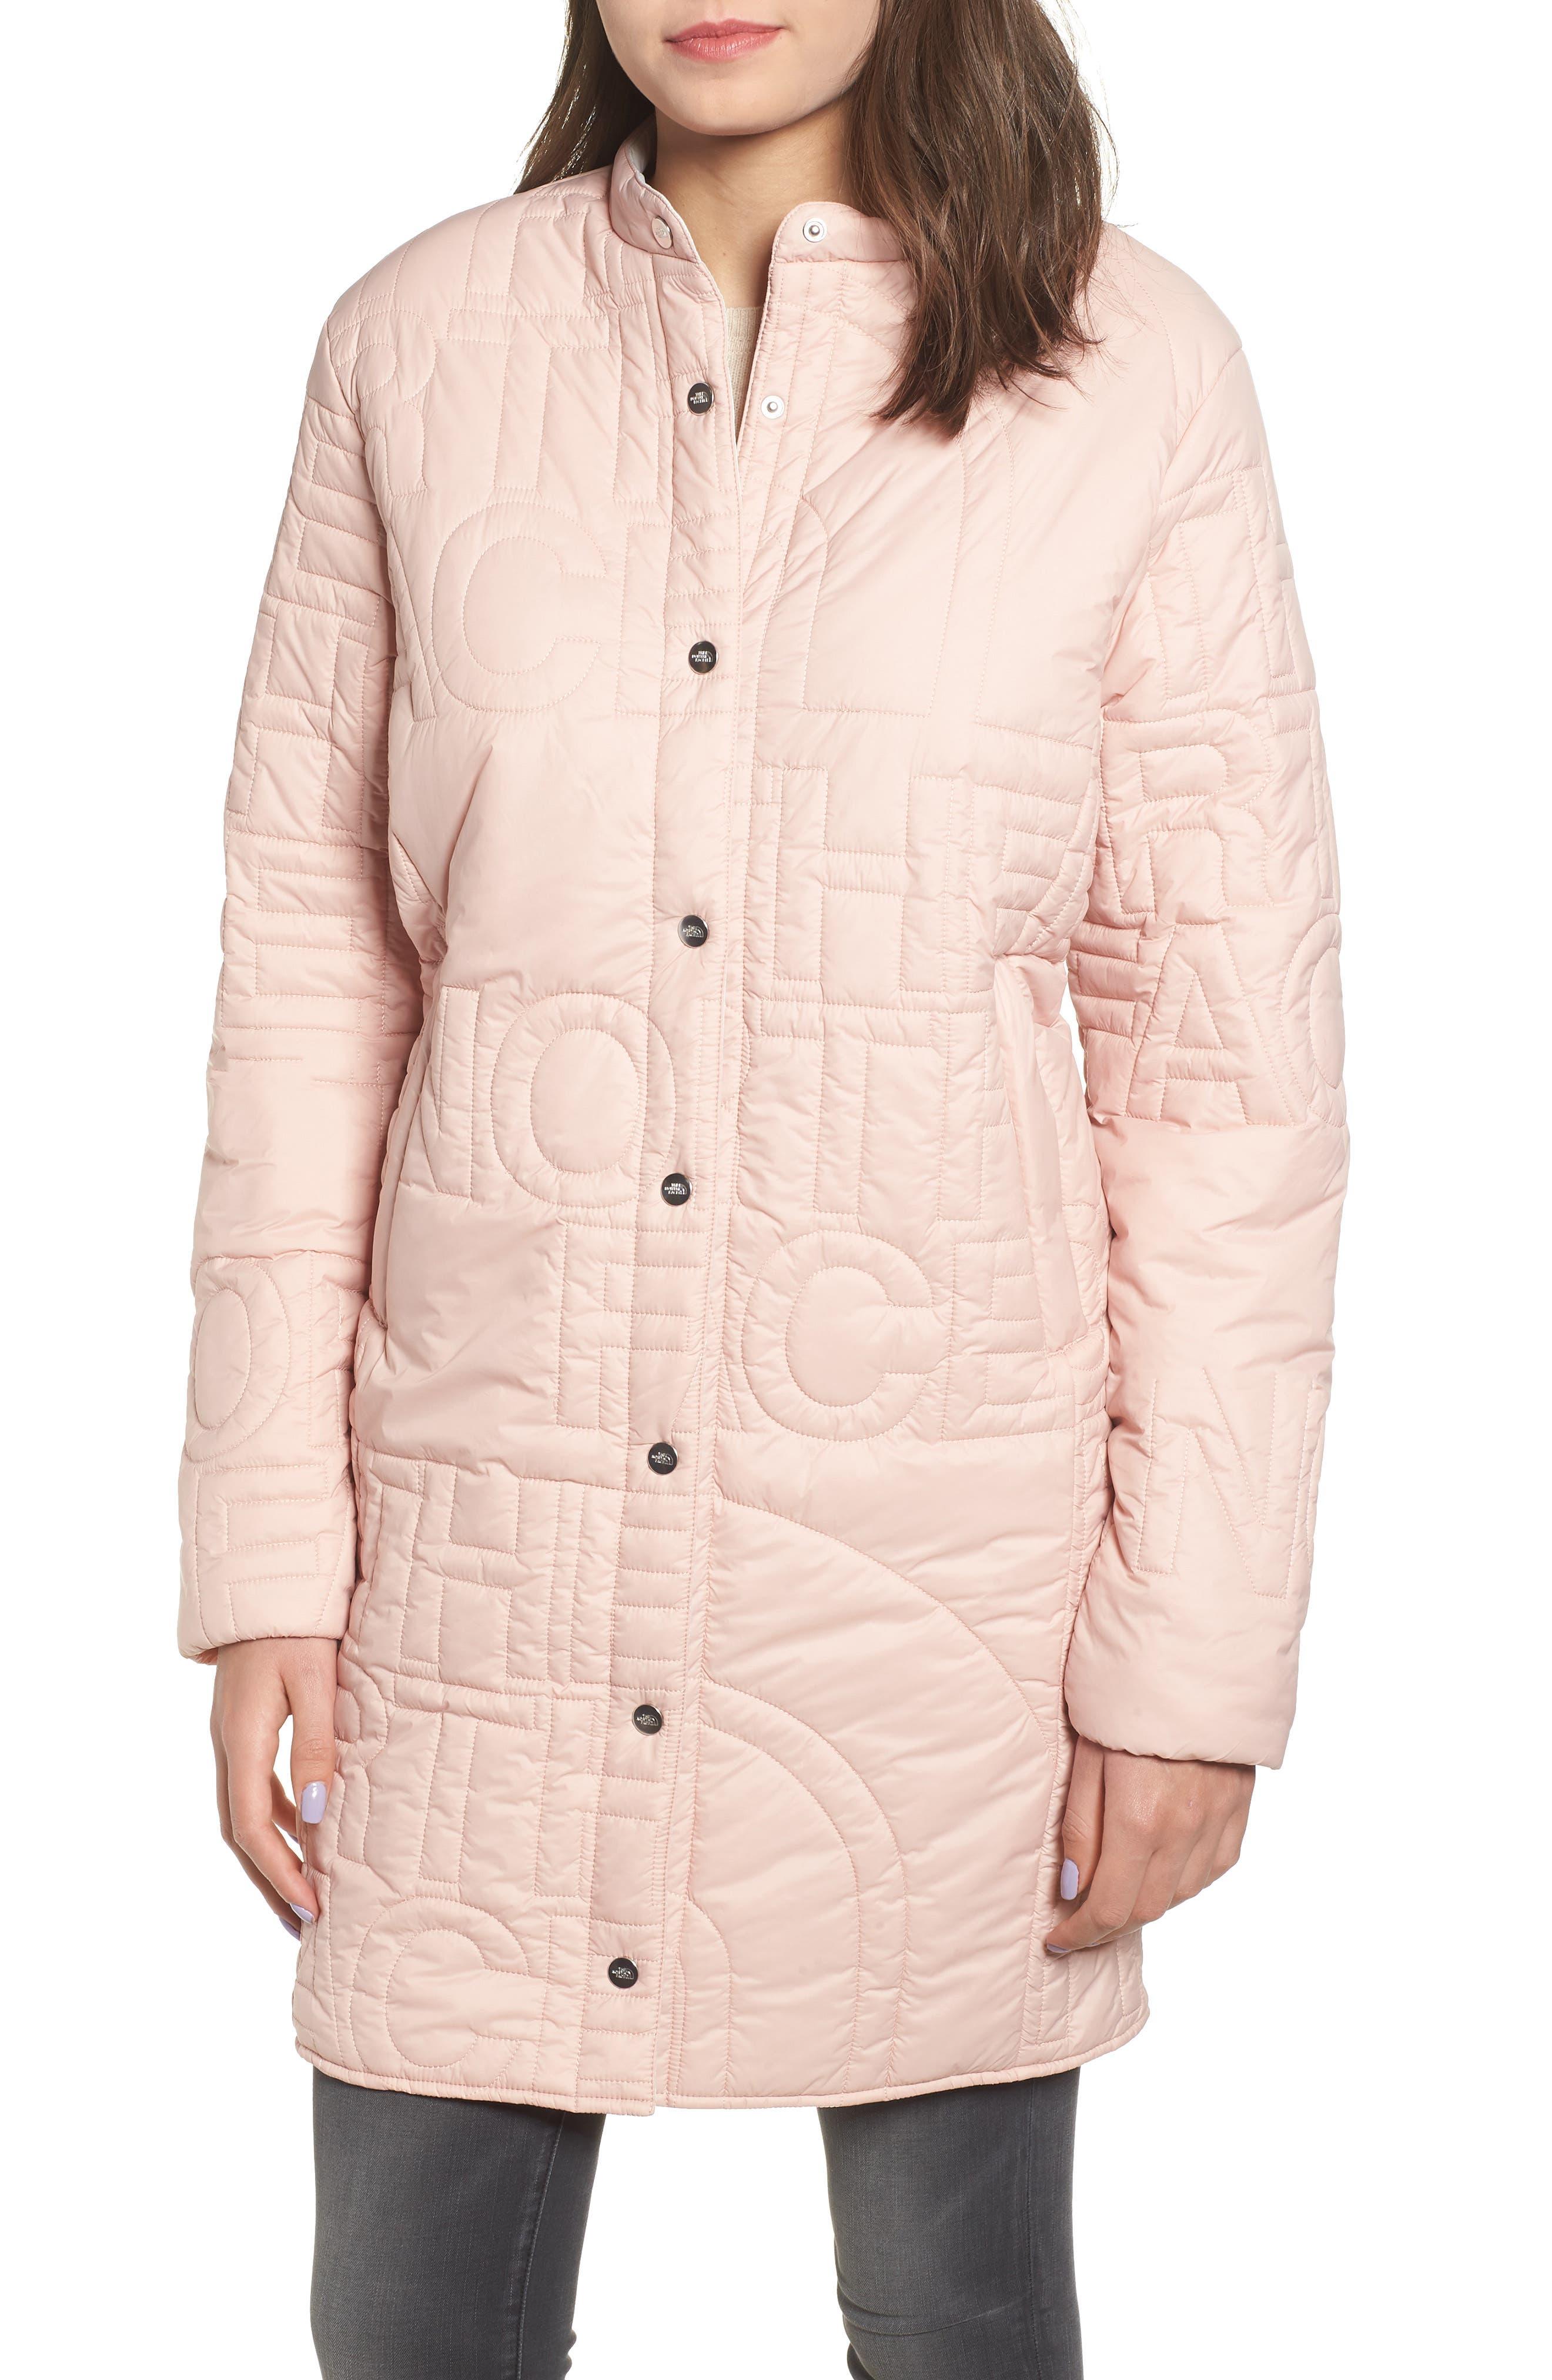 Jackets Nordstrom Coats Pink Women's amp; qBO0ZtZ